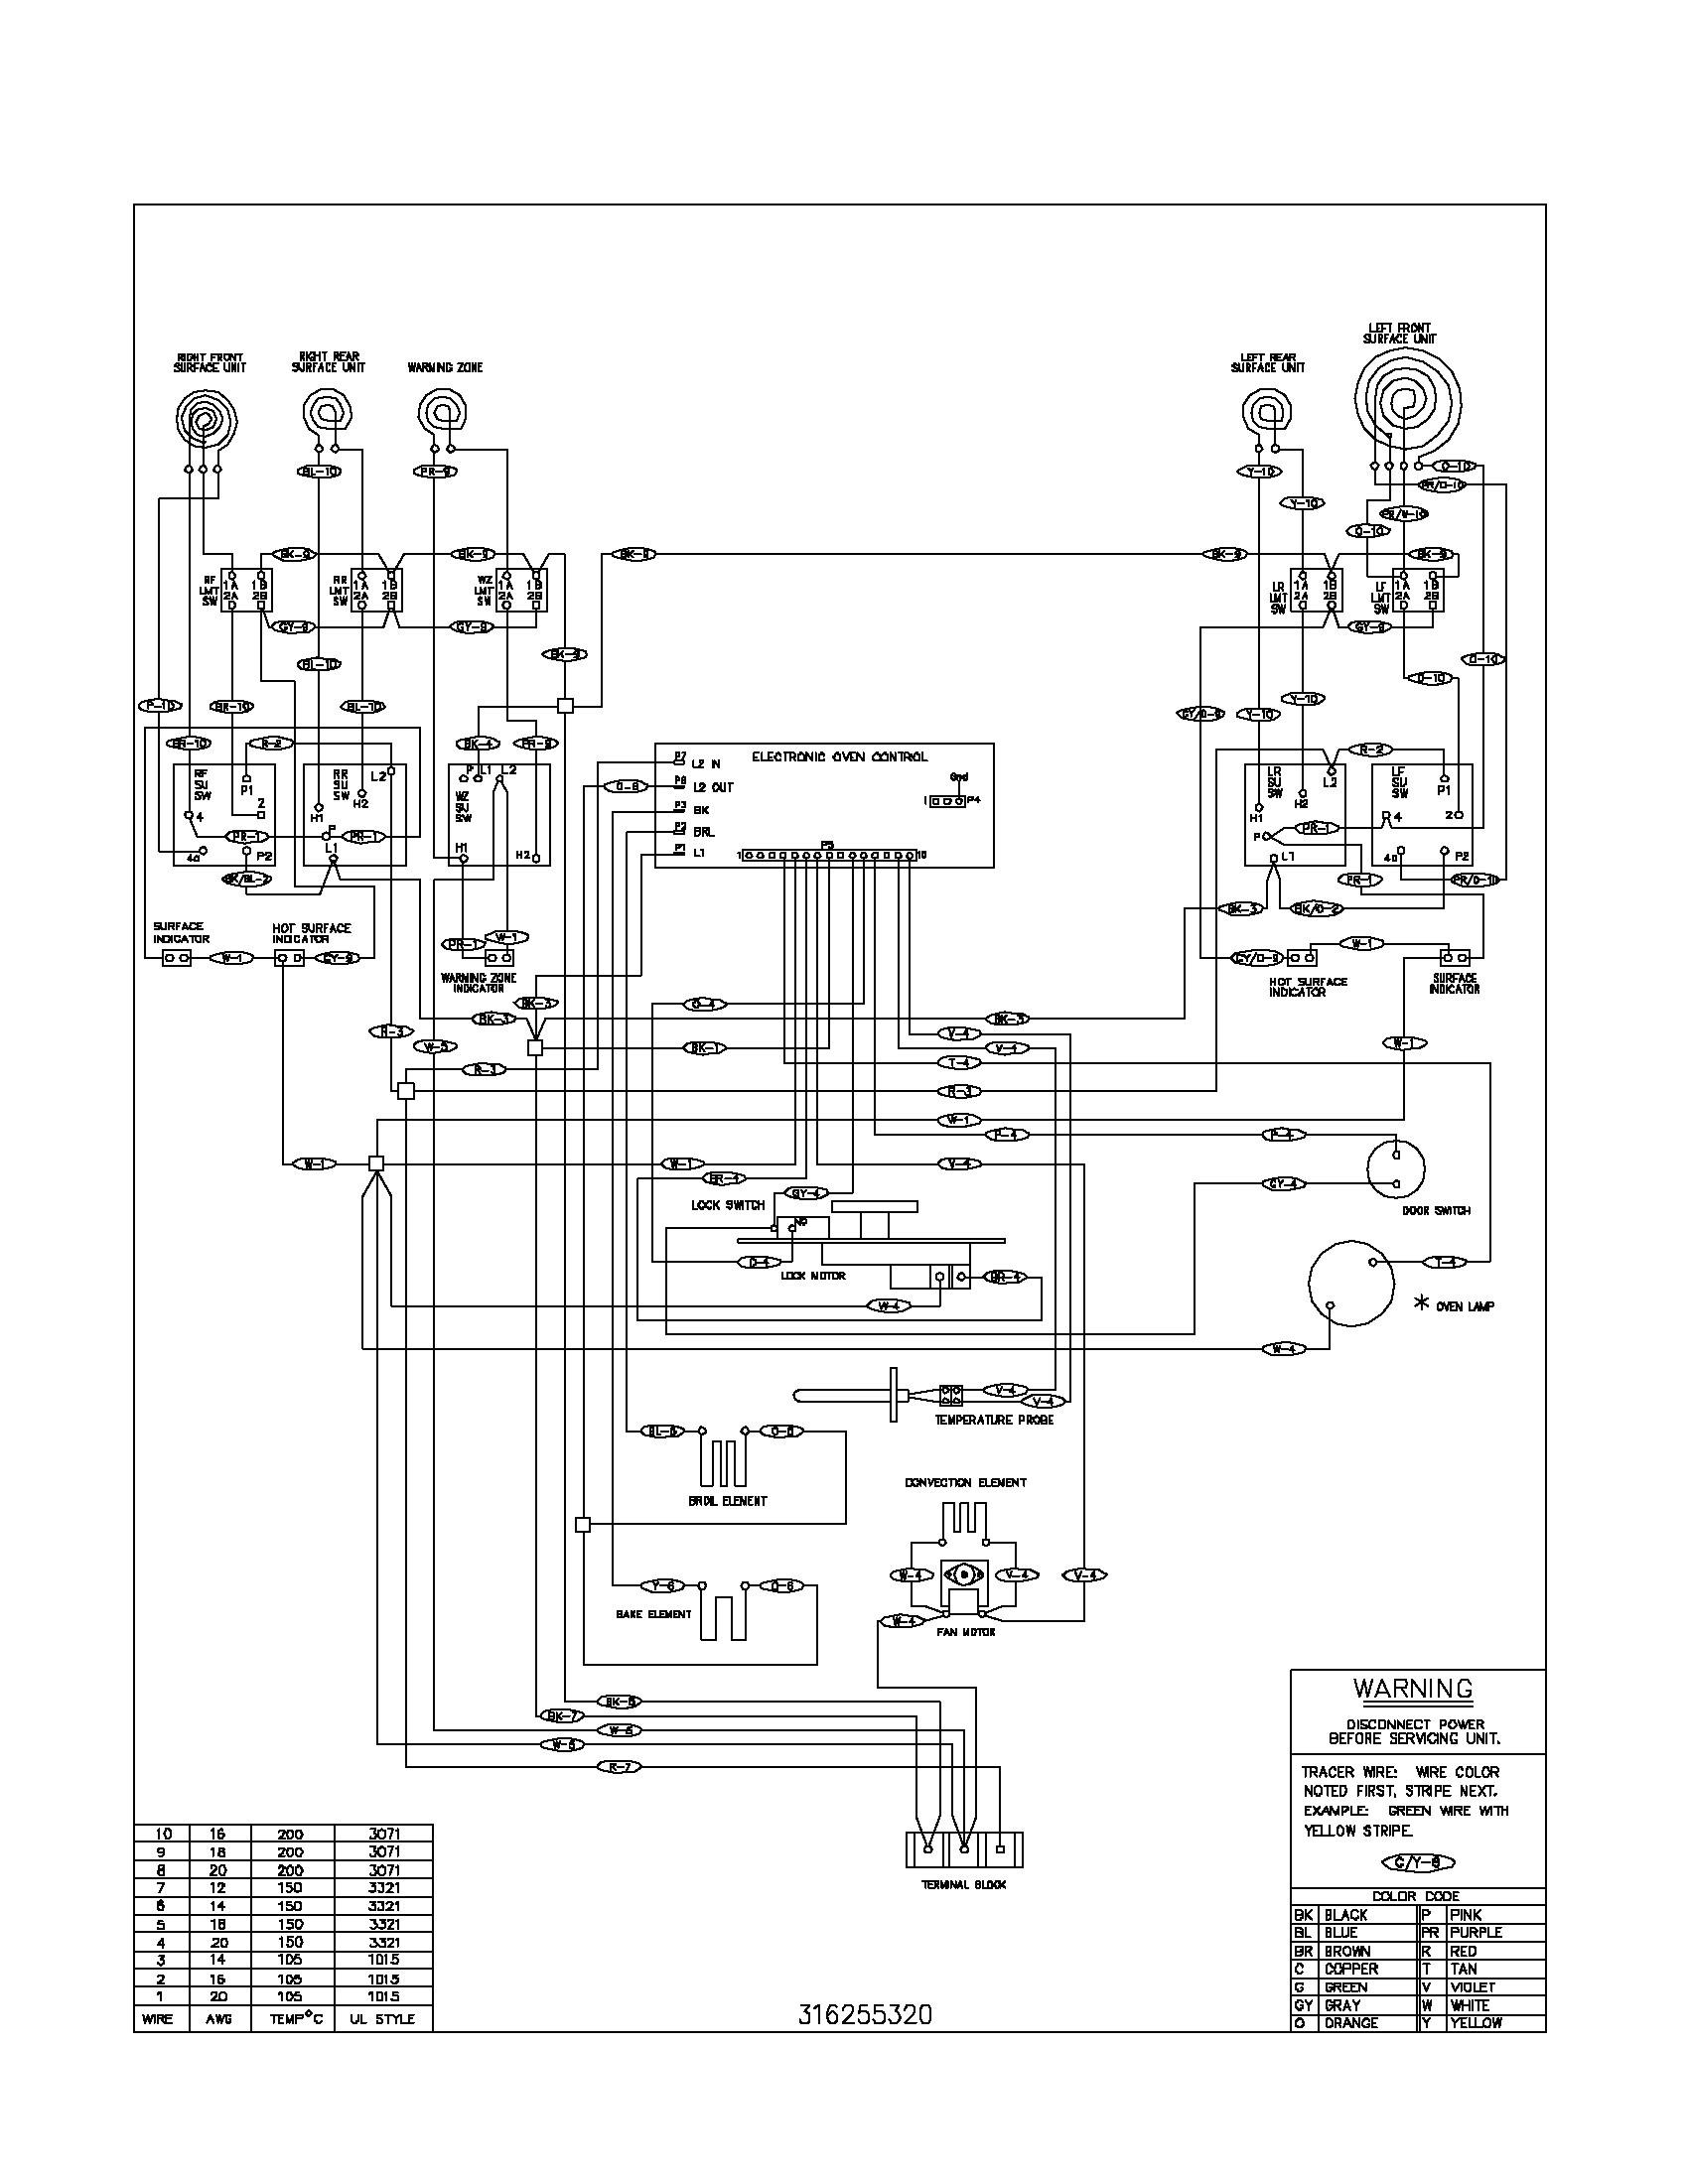 whirlpool dishwasher wiring diagram maytag refrigerator schematic electrical wiring whirlpool refrigerator circuit and wiring d wine cooler wiring diagram wiring diagrams maytag refrigerator jpg